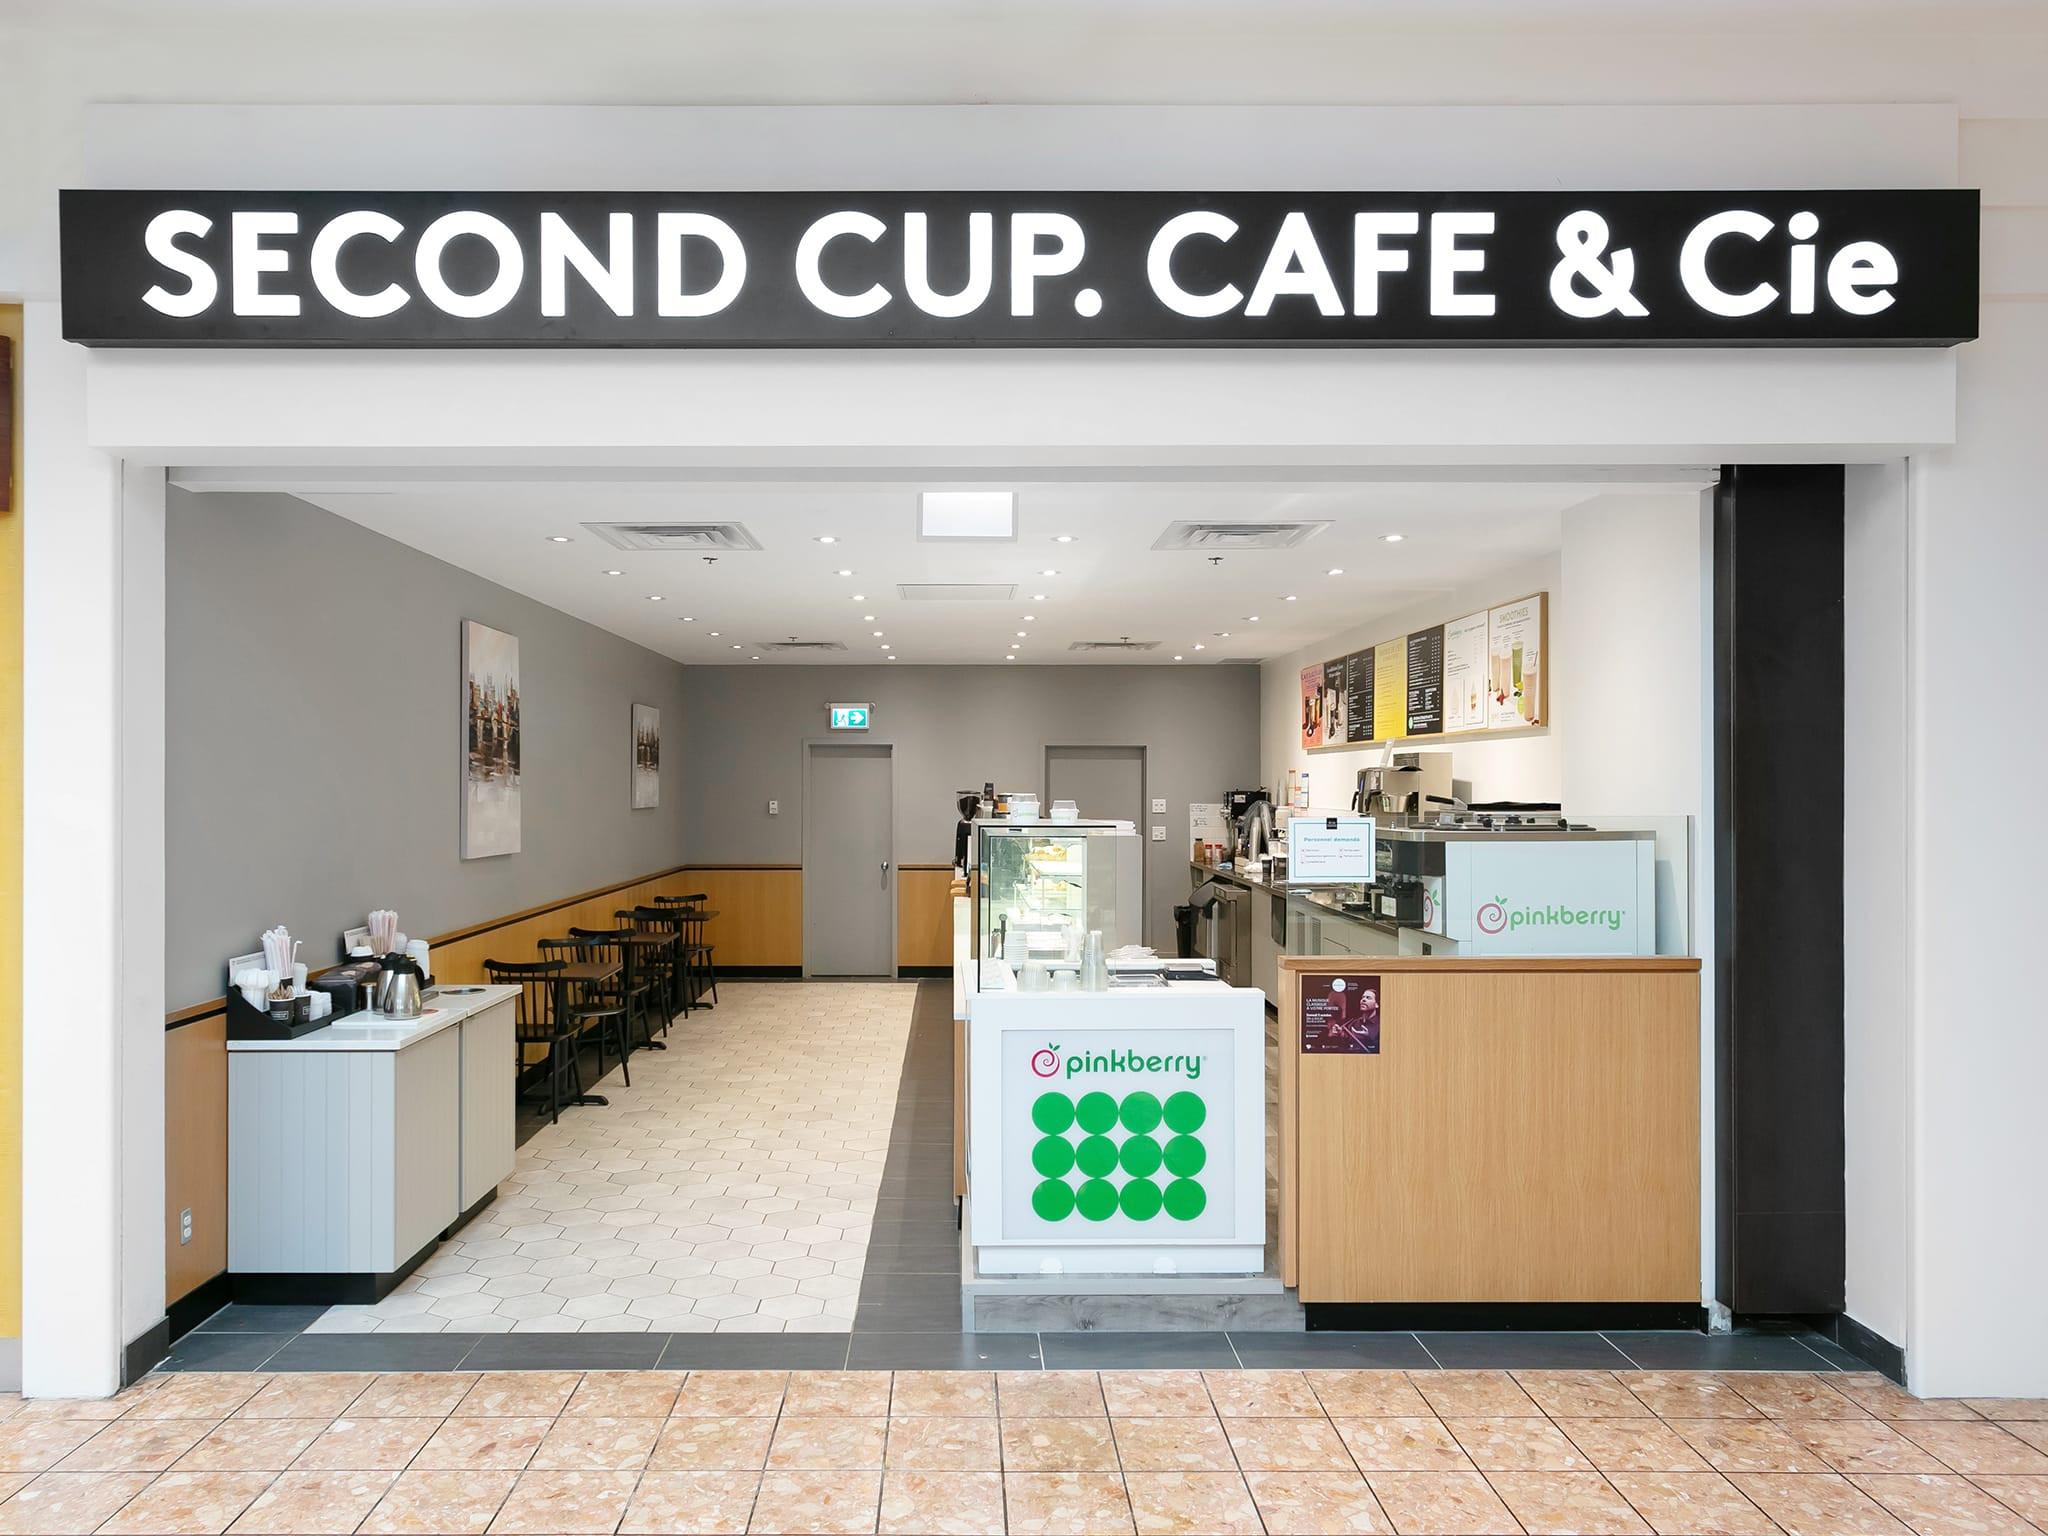 Second Cup Café & Cie - galeries - rive - nord